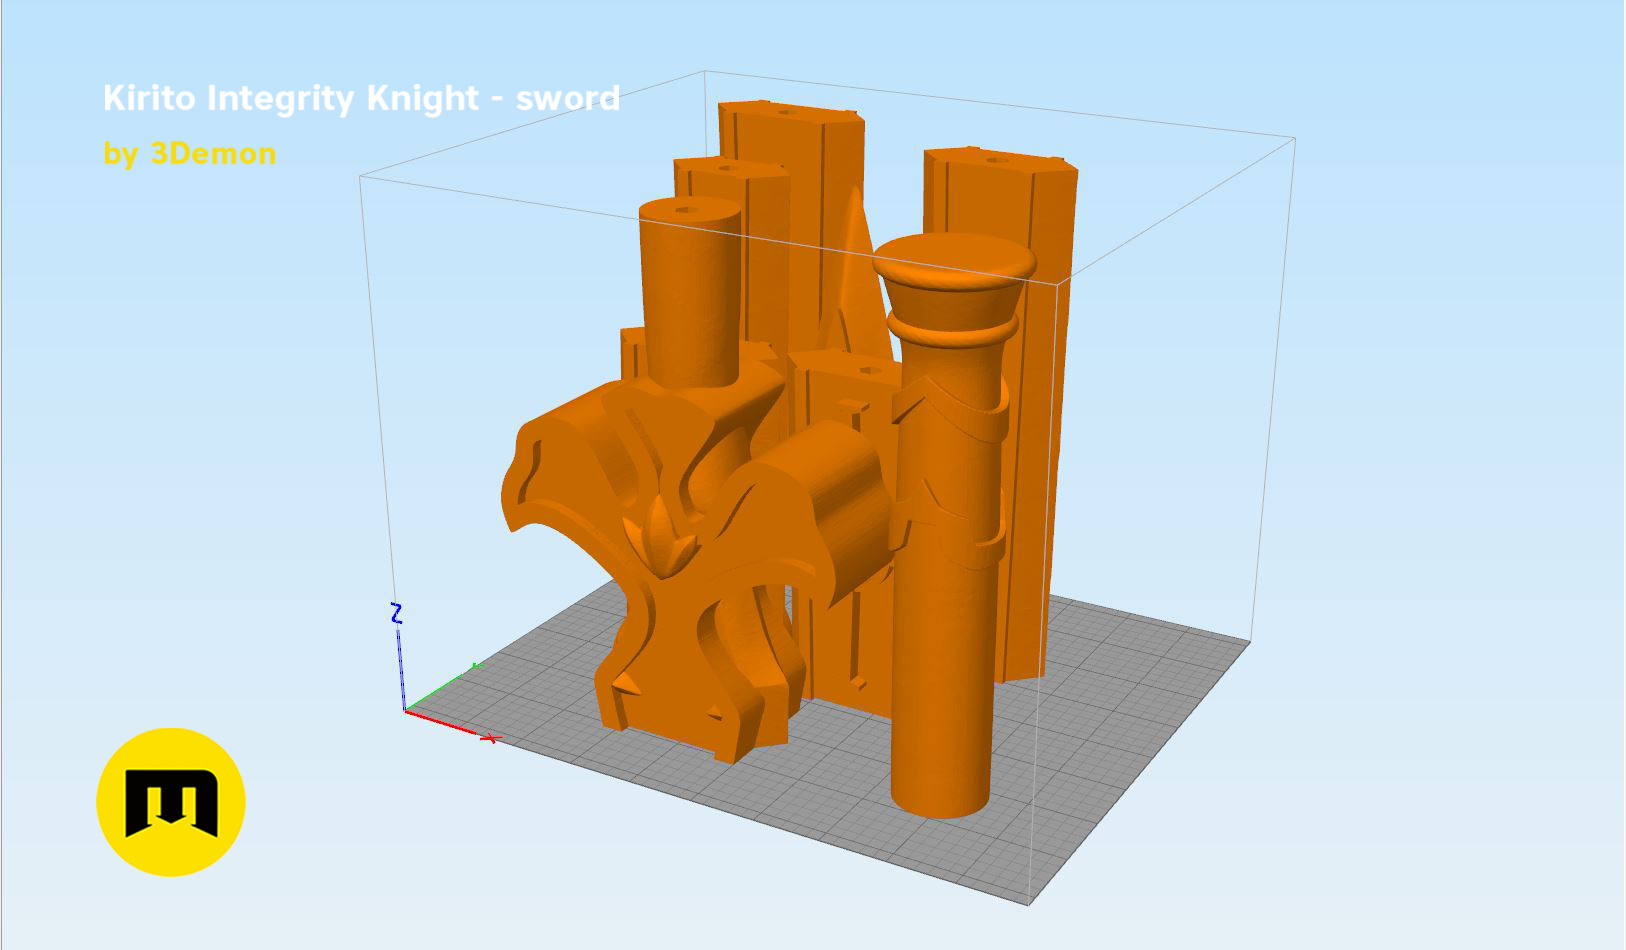 Kirito-sword-parts kopie.jpg Download STL file Kirito's Sword - Integrity Knight • 3D print model, 3D-mon